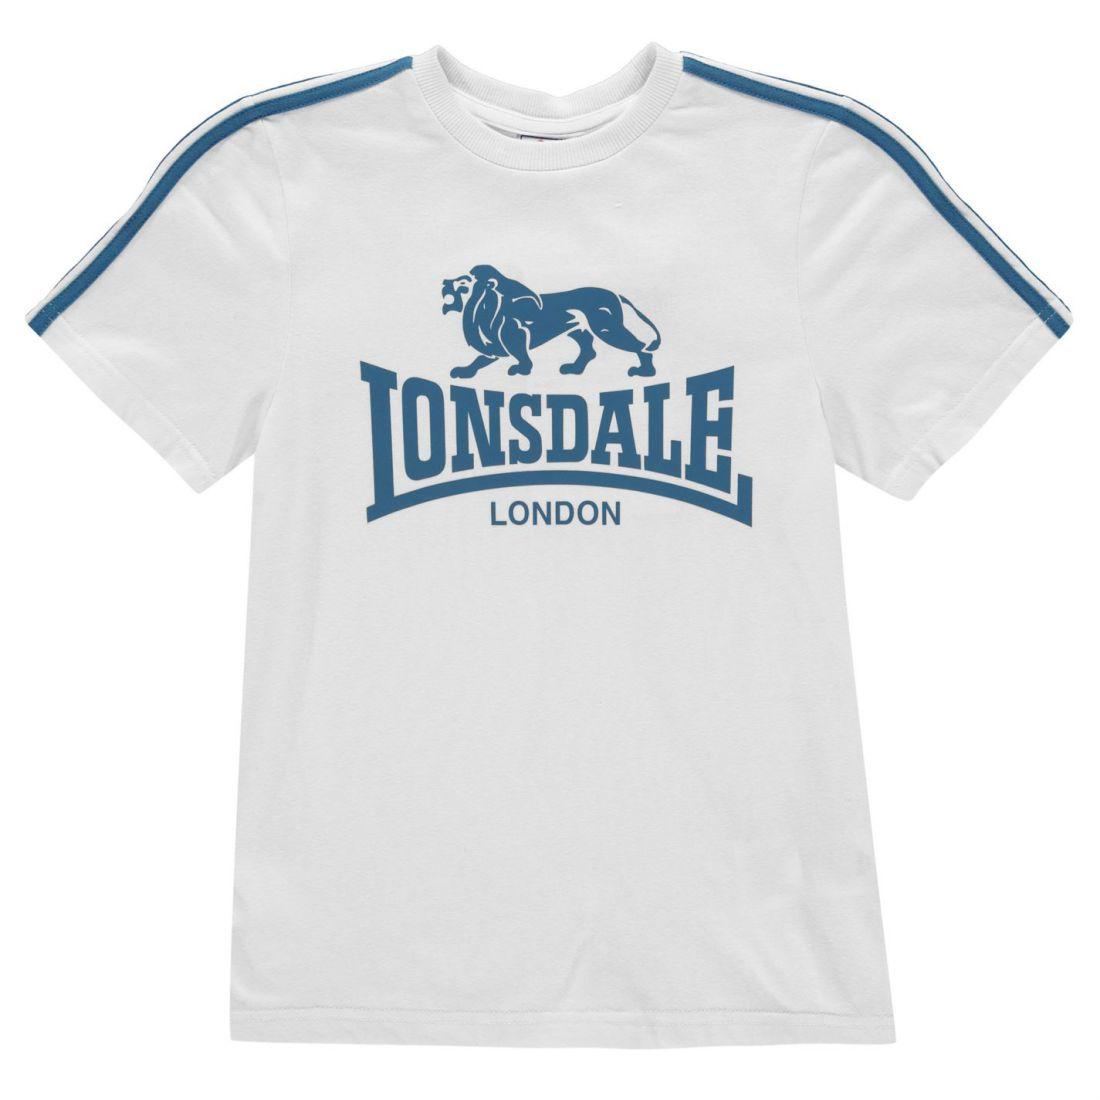 Details about Lonsdale Kids Boys Logo T Shirt Junior Crew Neck Tee Top  Short Sleeve 27d0547f824